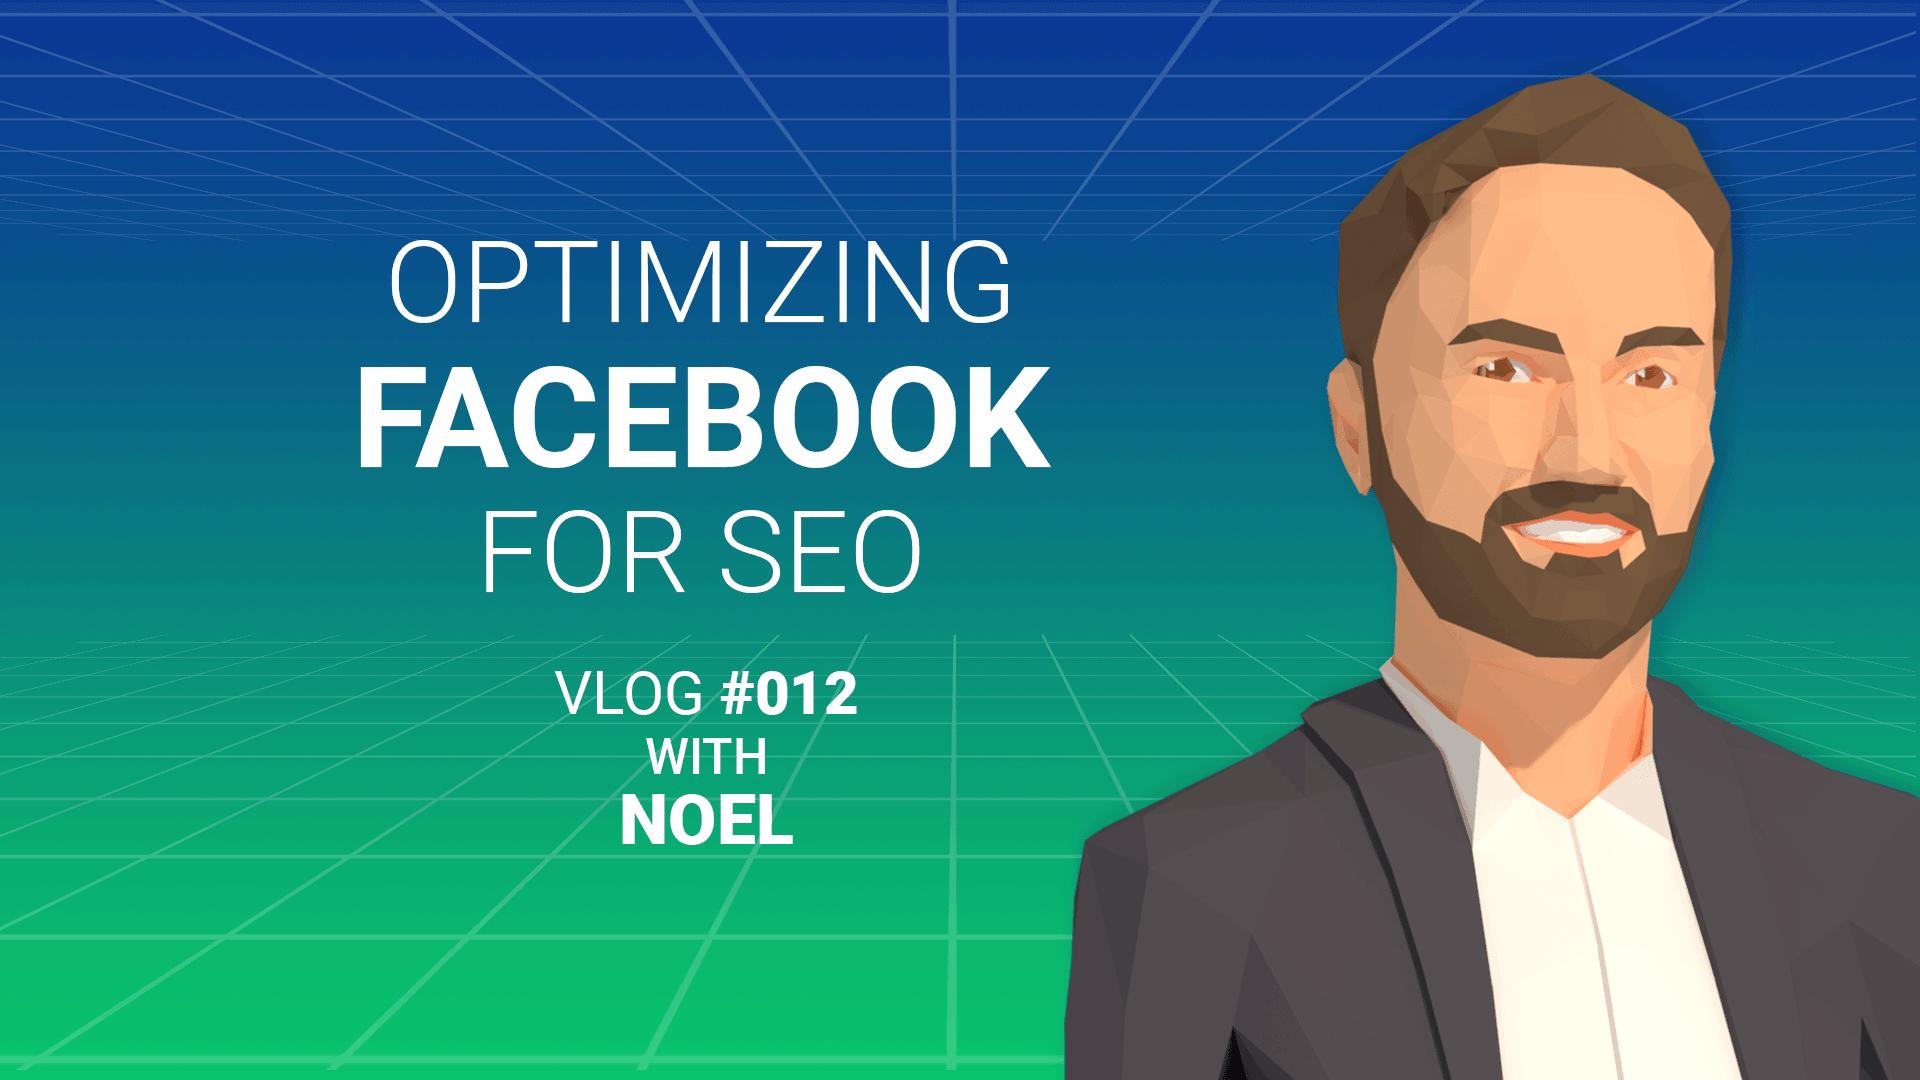 Optimizing Facebook for SEO